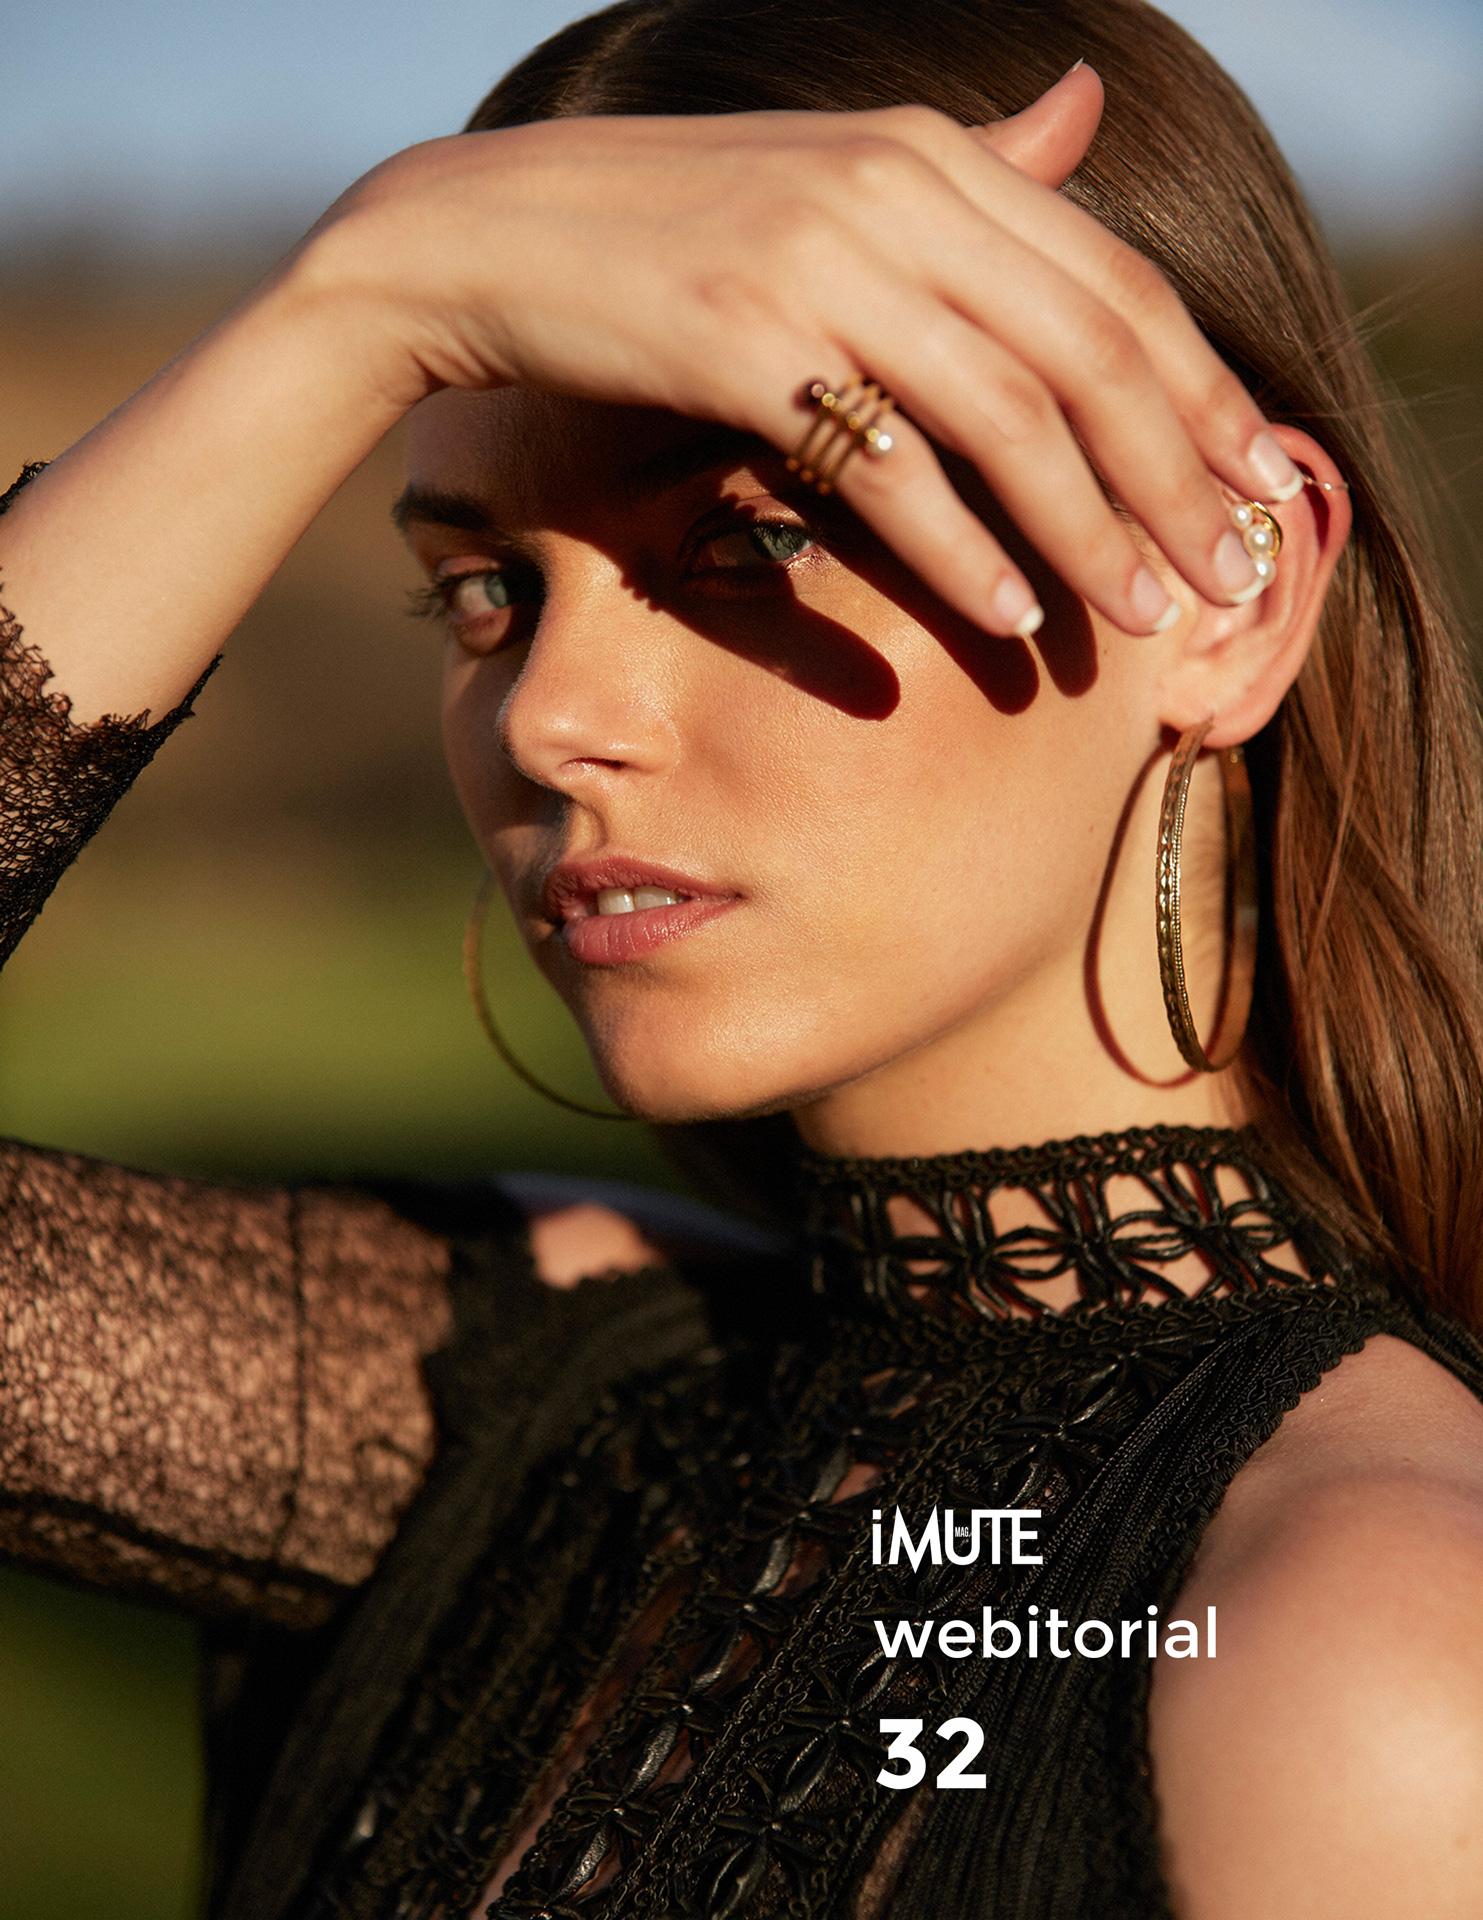 Walk the Wildwood webitorial for iMute Magazine Photographer & Makeup Morey Spellman Model  Kelly Rose @TWO Model Management Stylist Jasmine Liddell Makeup & Hair  Veronica Chanel